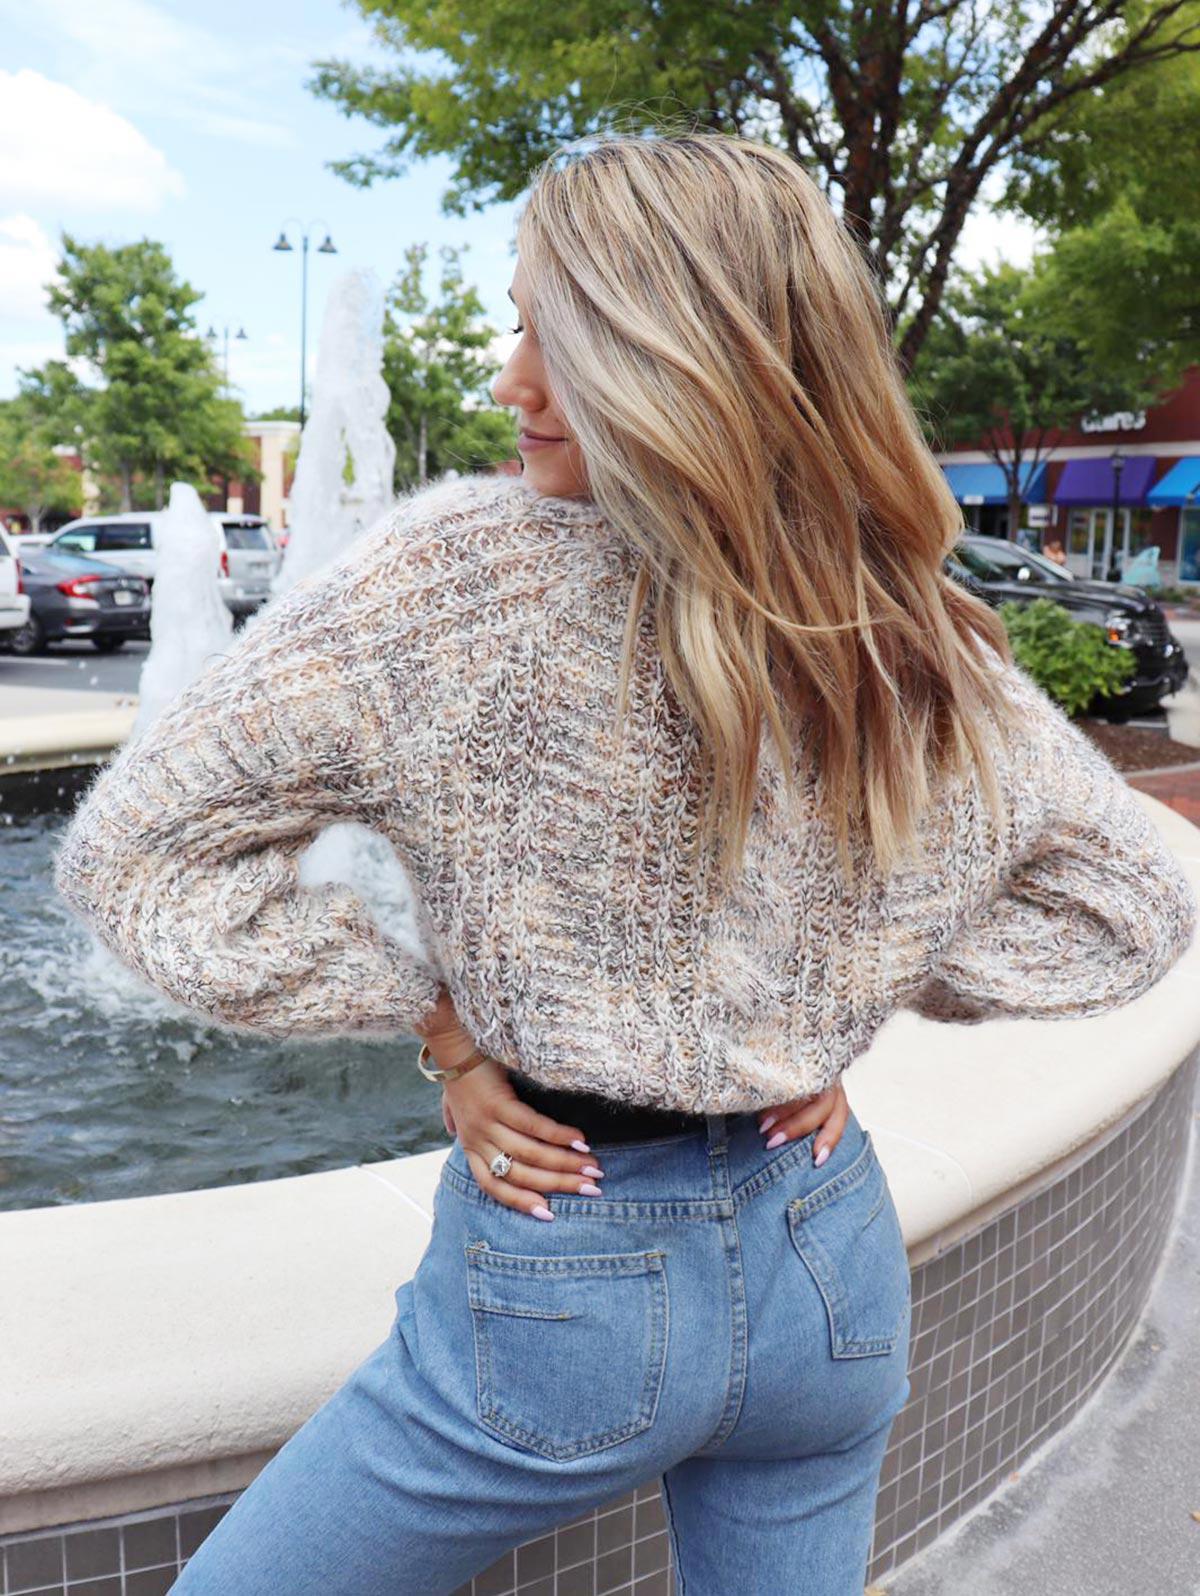 ZAFUL x Yasmine Bateman Heathered Cable Knit Chunky Sweater фото